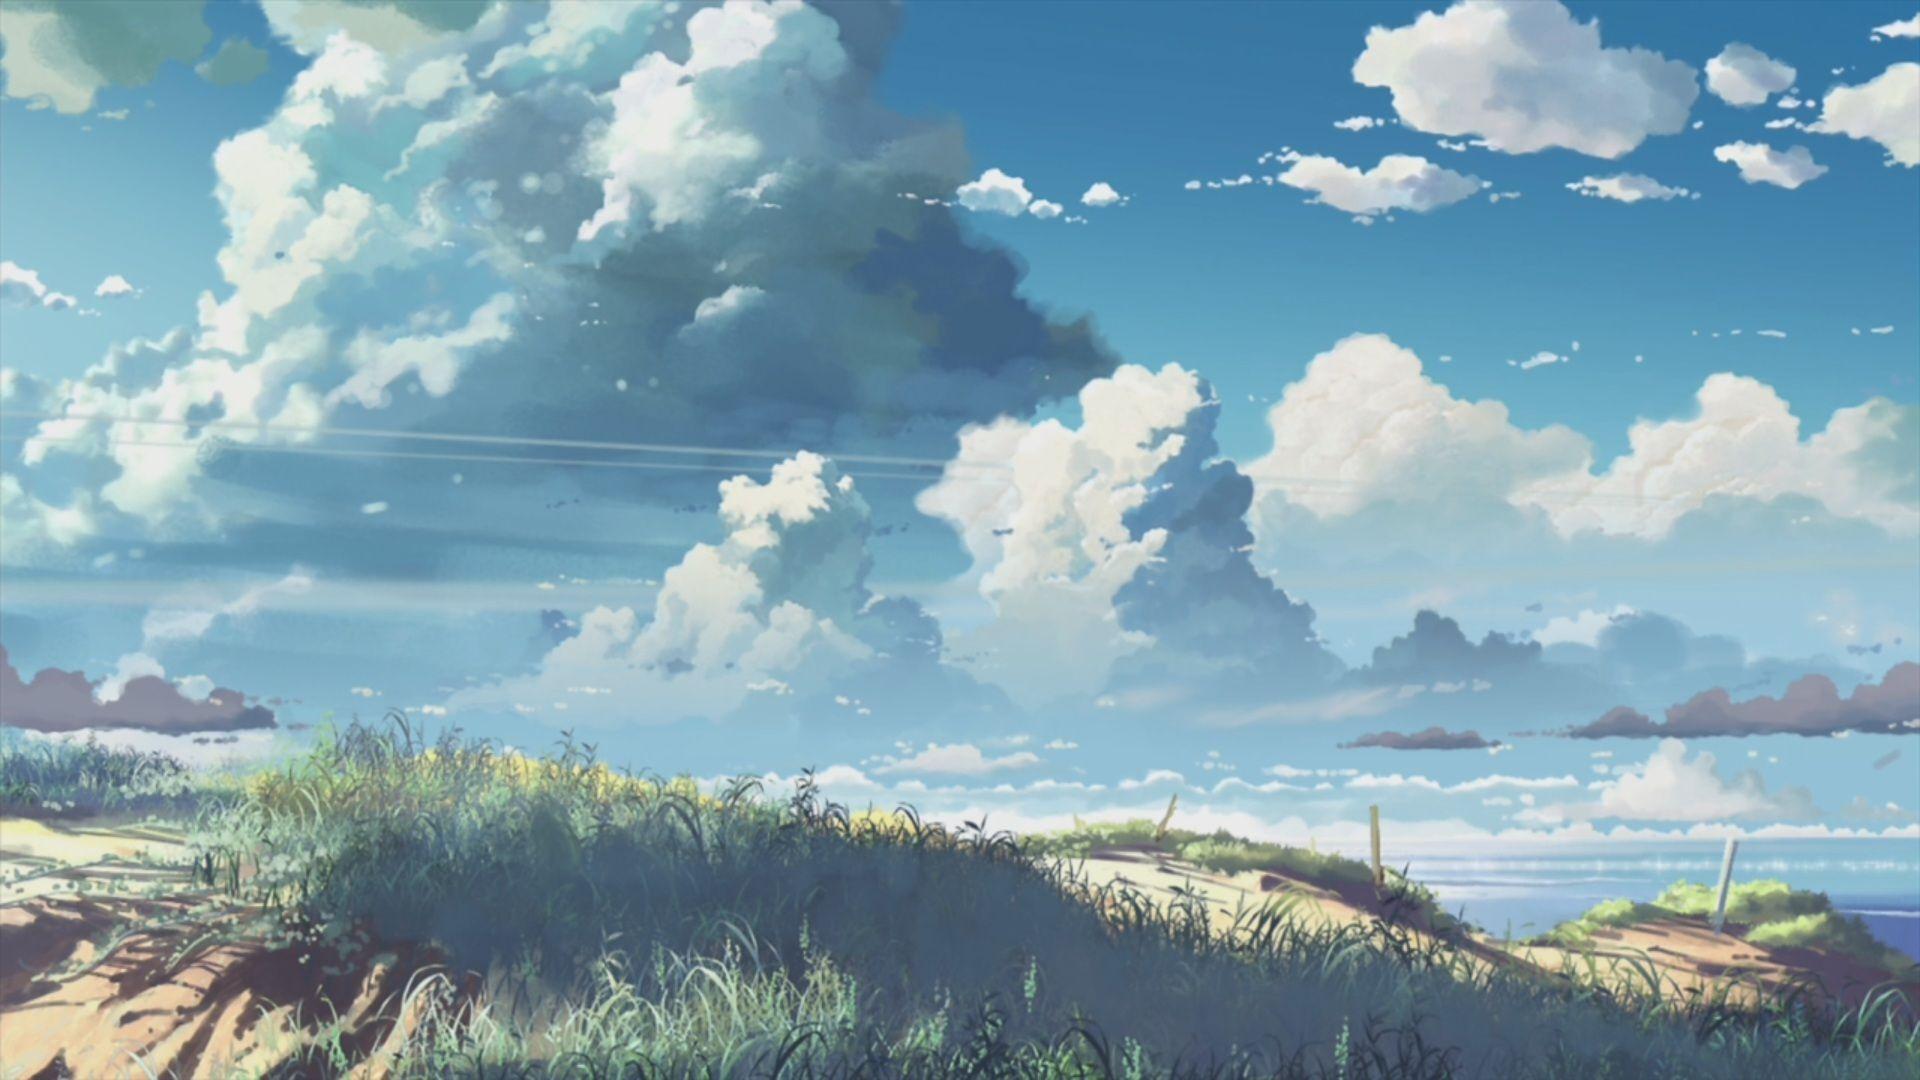 Anime Scenery Wallpapers Wallpapervortex Com